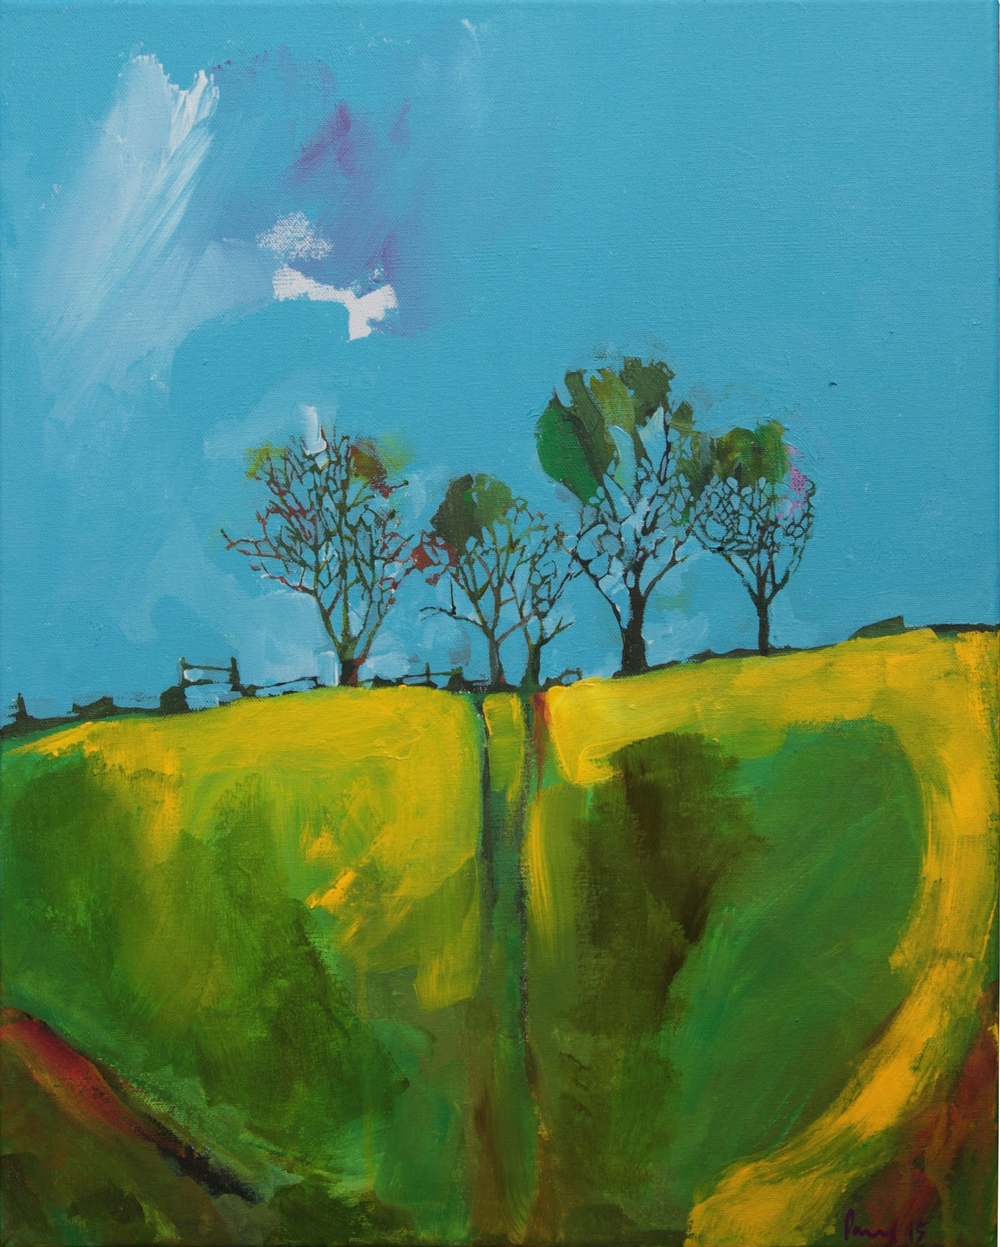 Treeline  2015 | 51 x 40.5 x 1.5cm Acrylic on canvas Signed  SOLD